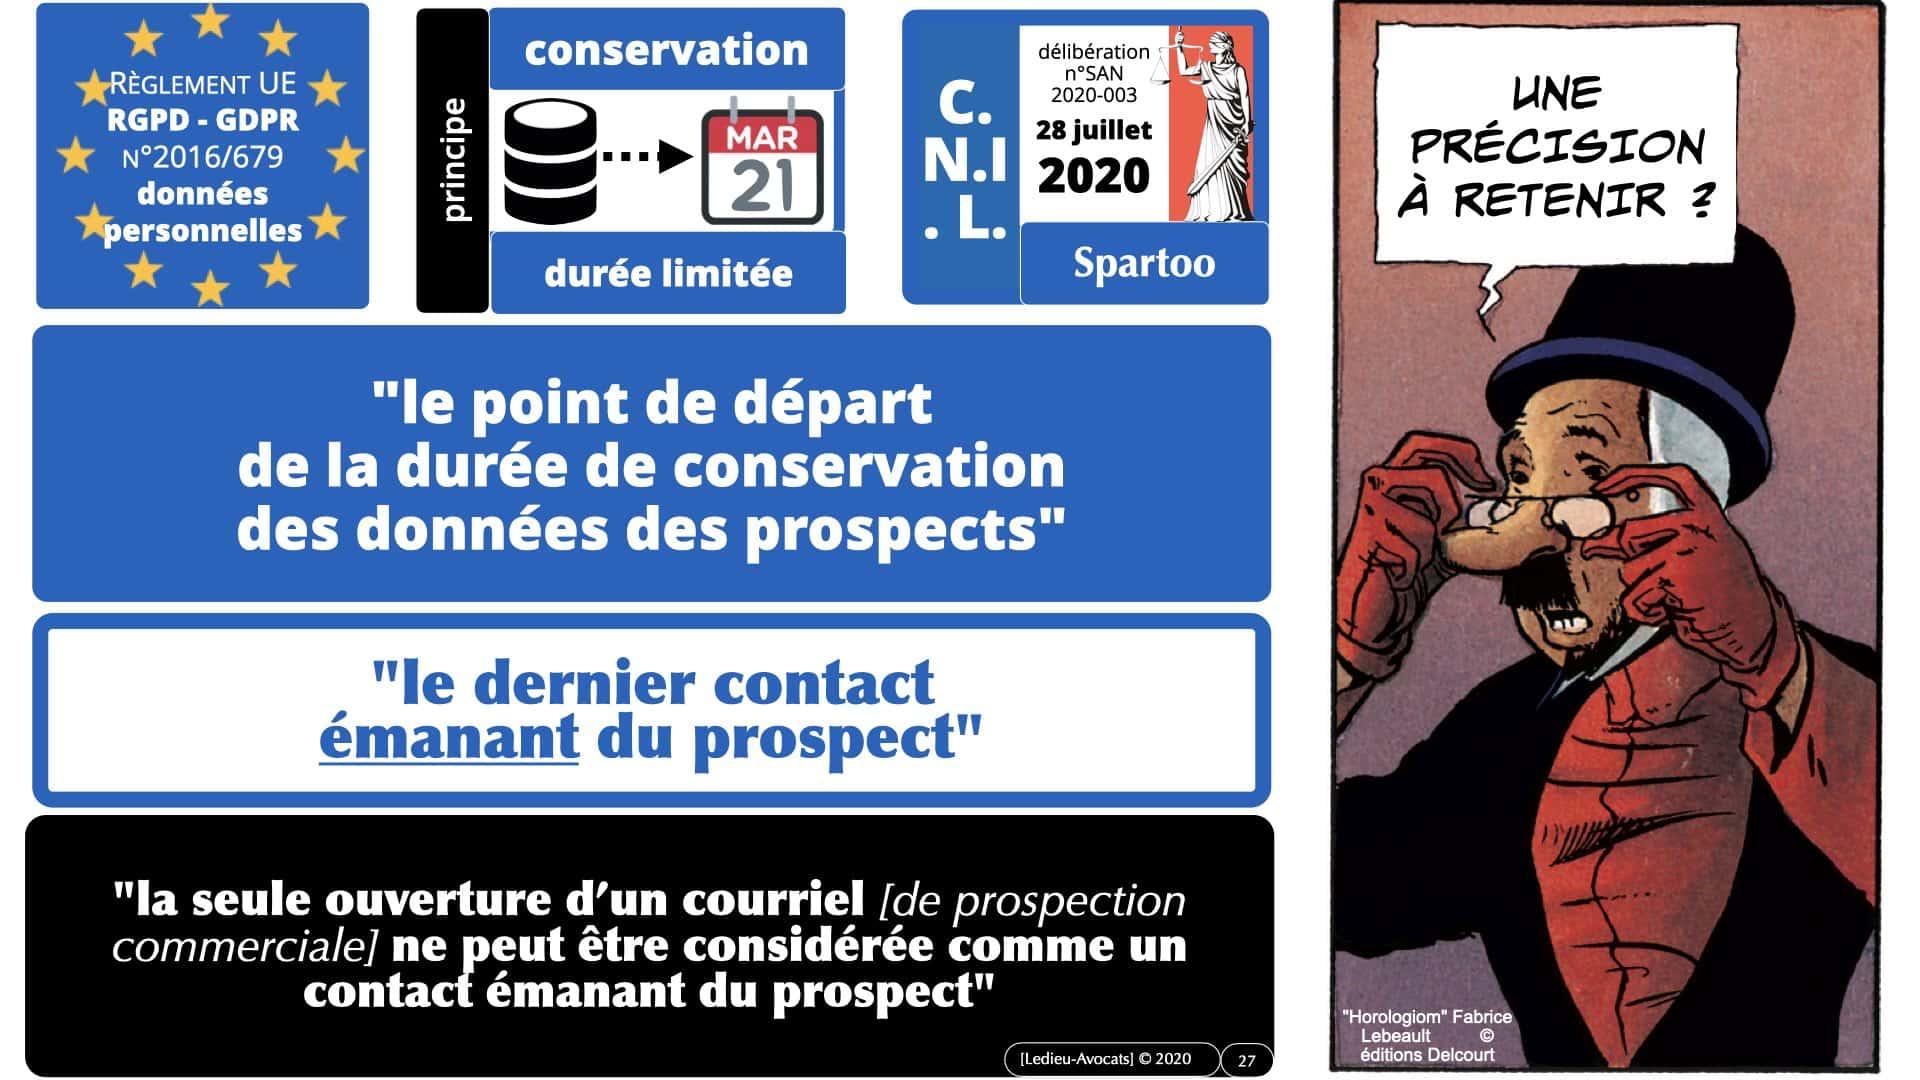 RGPD délibération CNIL Spartoo du 28 juillet 2020 n°SAN 2020-003 MOTIF 05